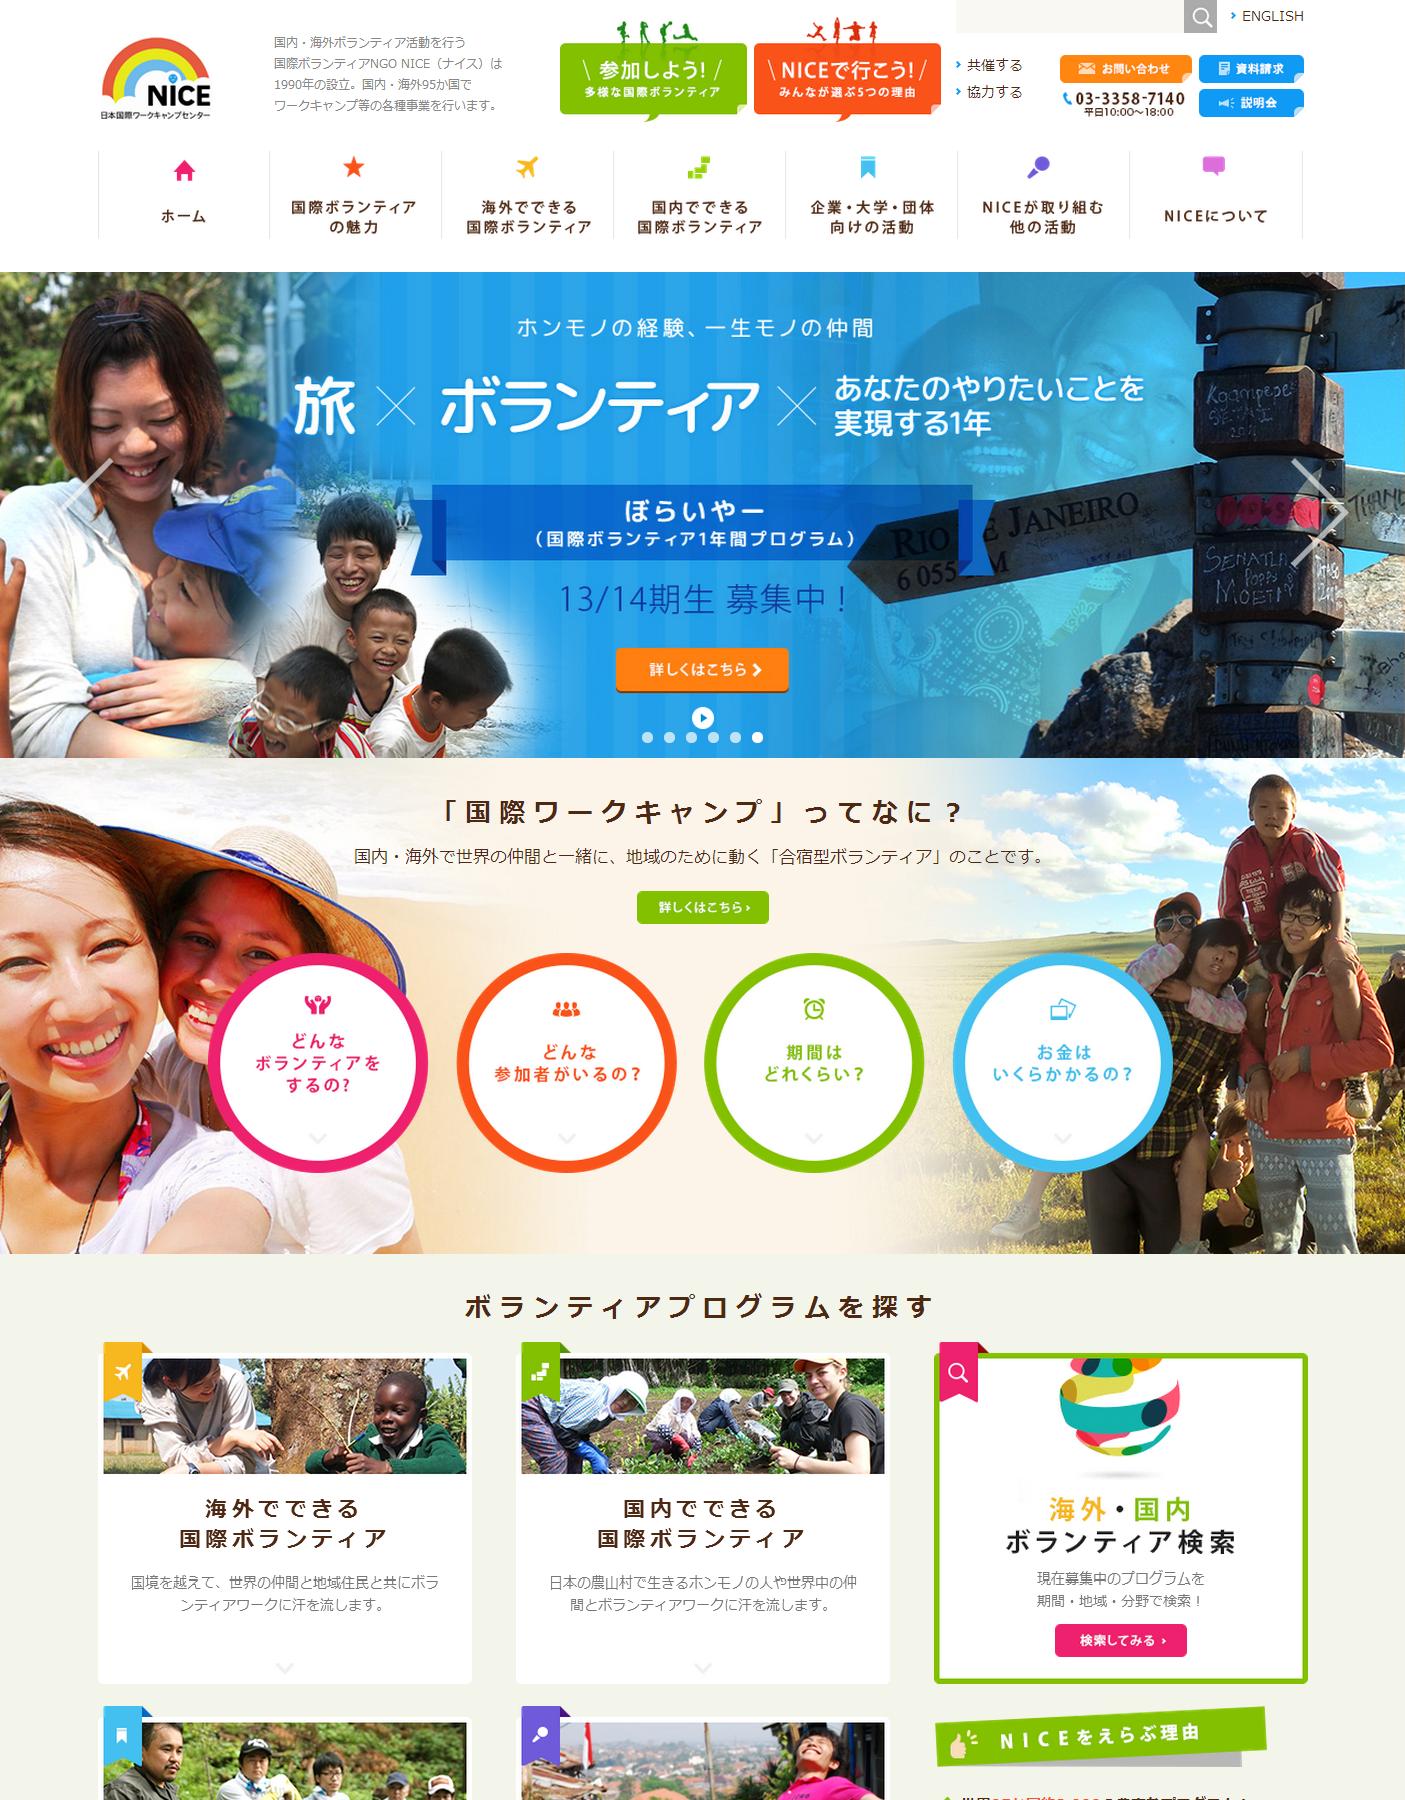 http://www.ark-web.jp/blog/images/nice01.png